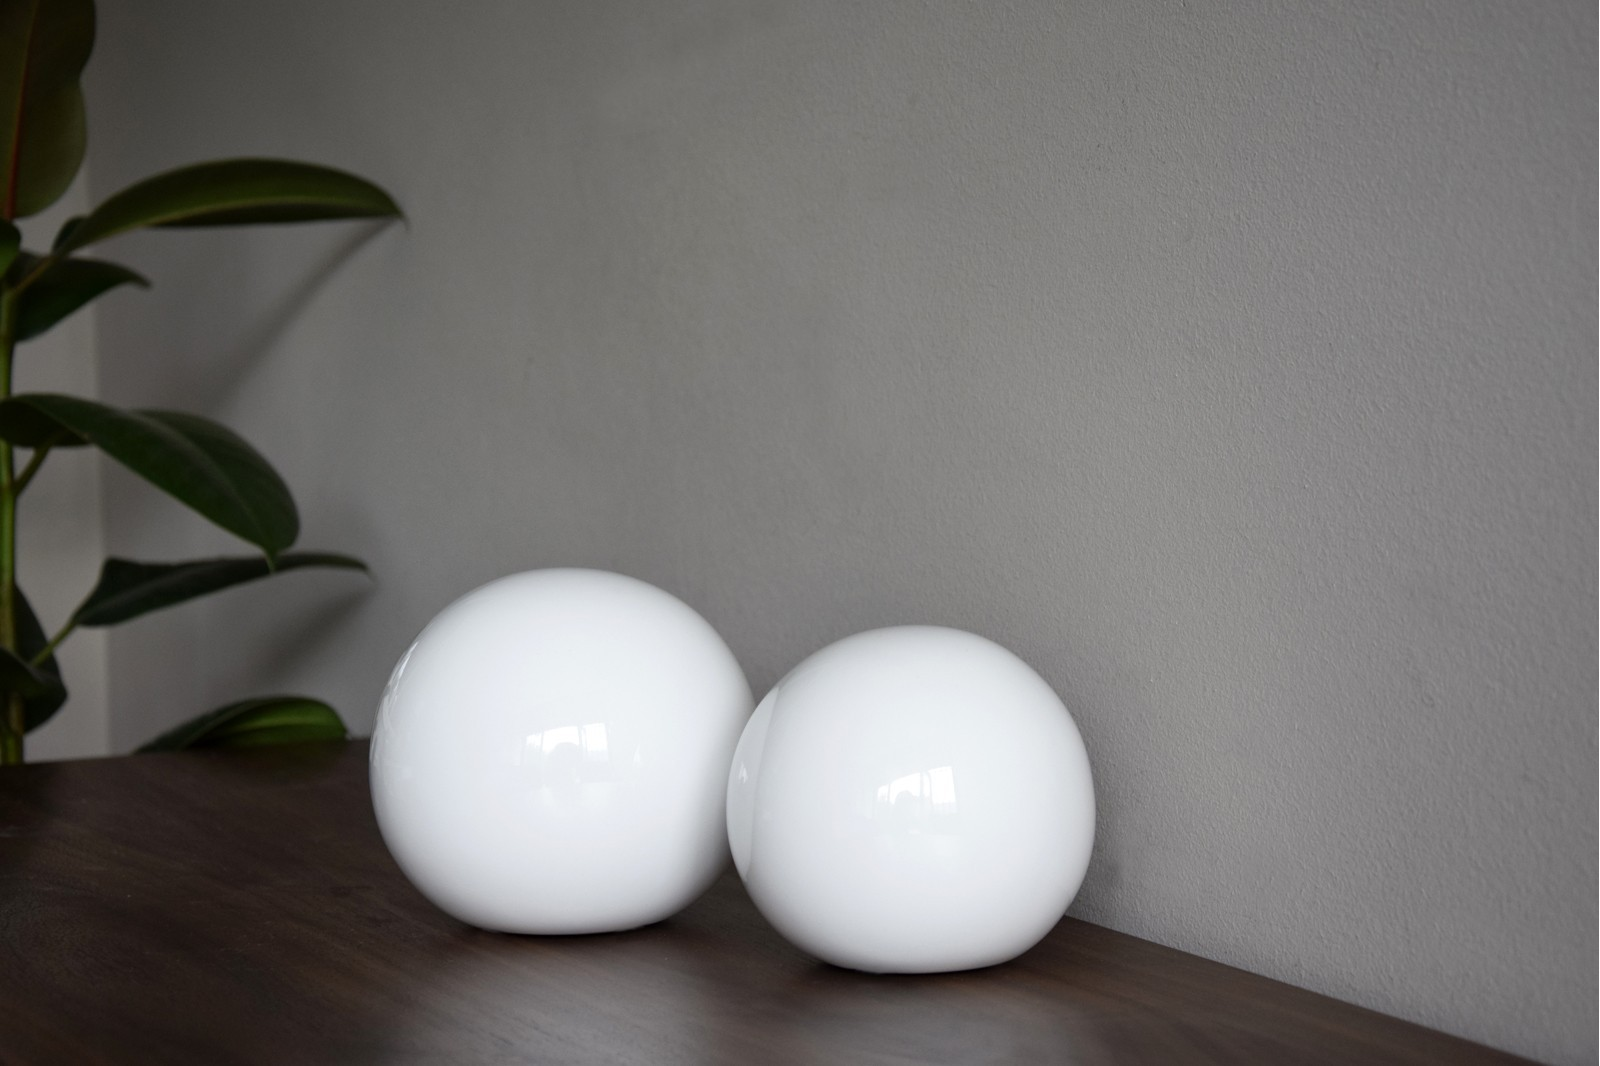 CERAMIC SMOOTH WHITE BALLS COLLECTION